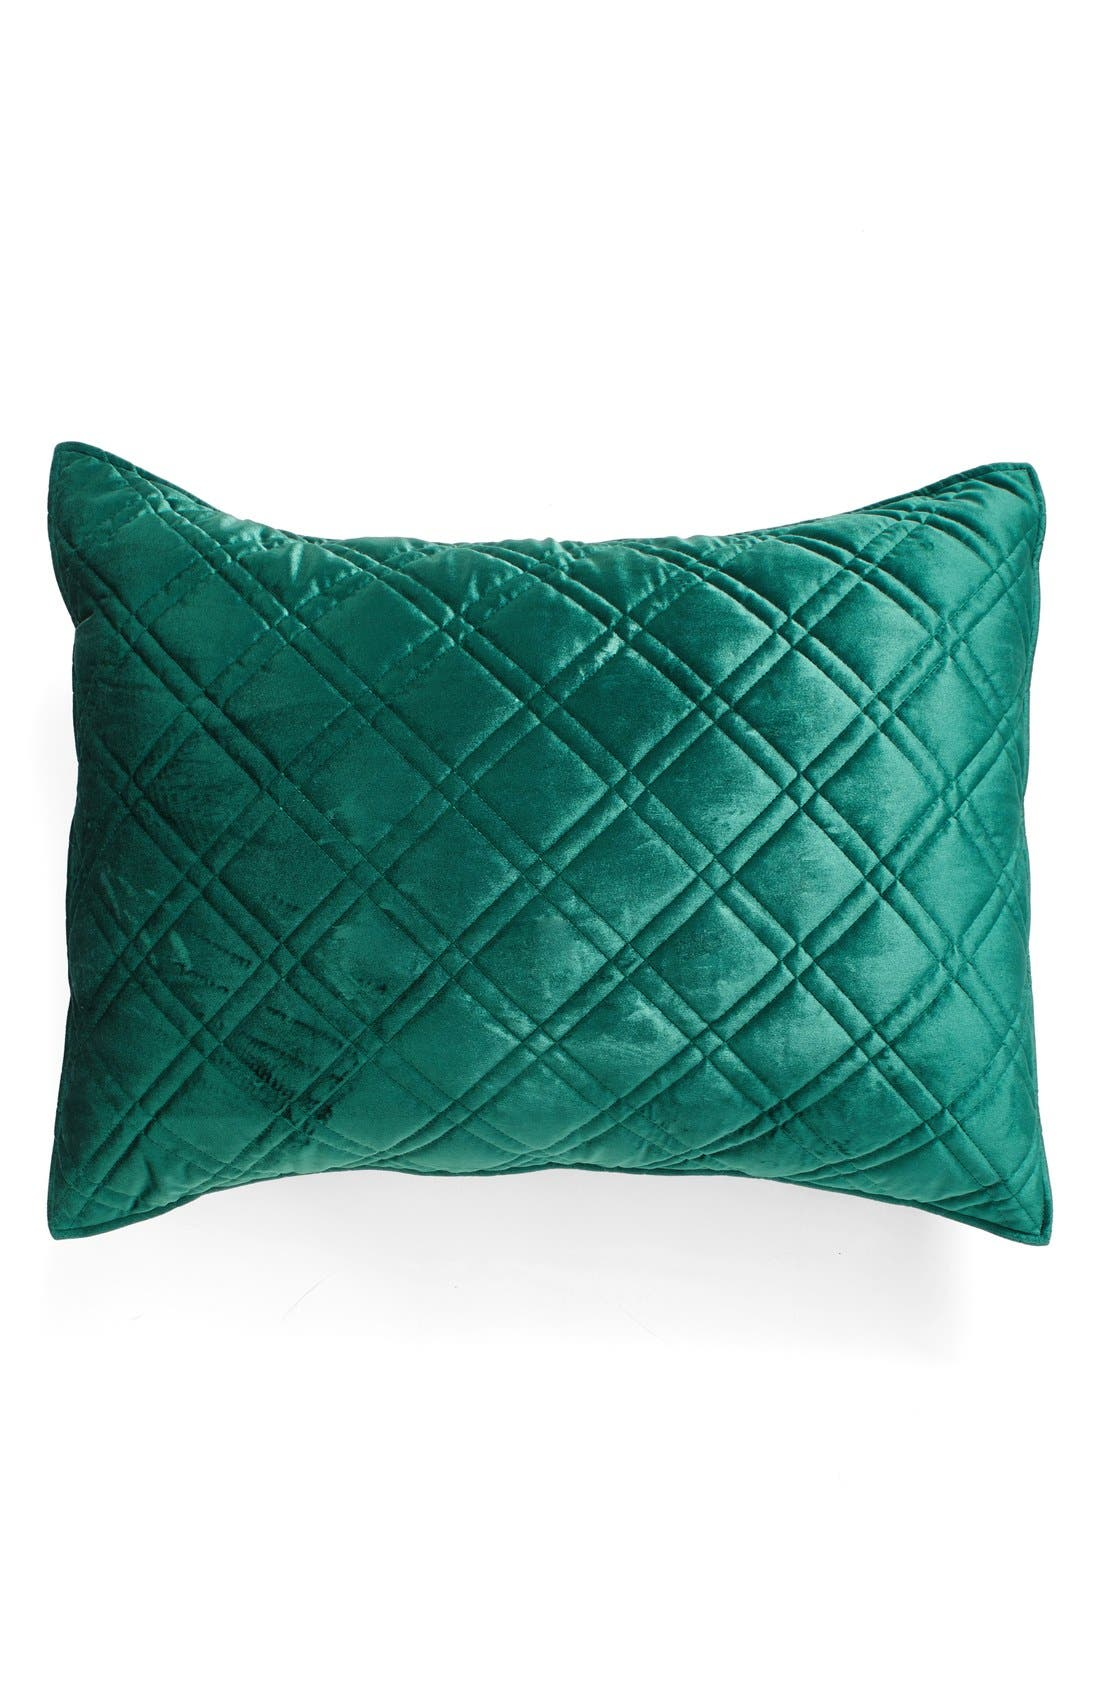 Quilted Velvet Standard Sham,                             Main thumbnail 1, color,                             Emerald